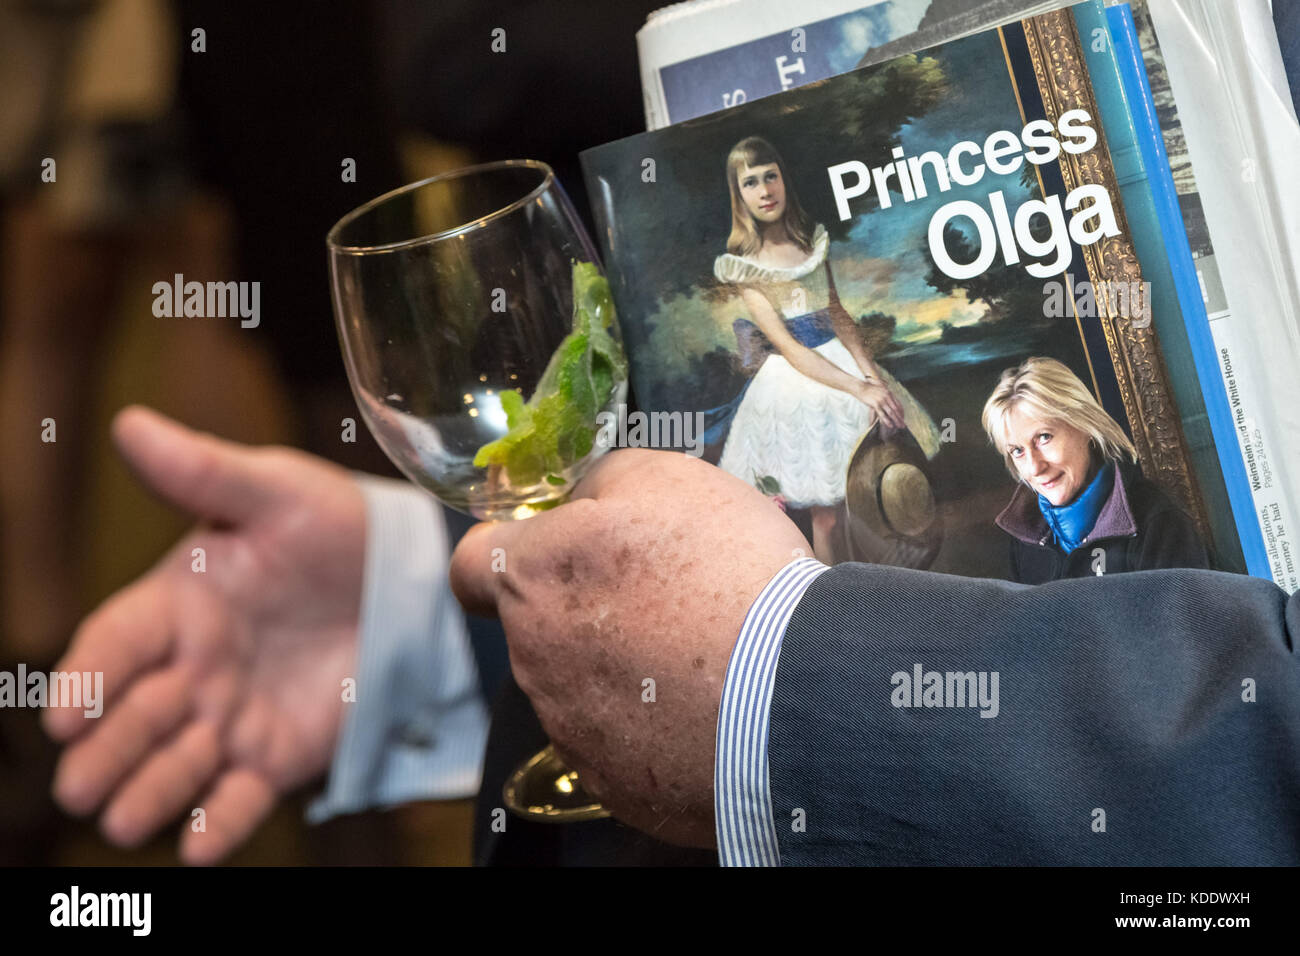 London, UK. 12th Oct, 2017. Princess Olga Romanoff, descendant of the last Tsar of Russia, Nicholas II, signs copies Stock Photo